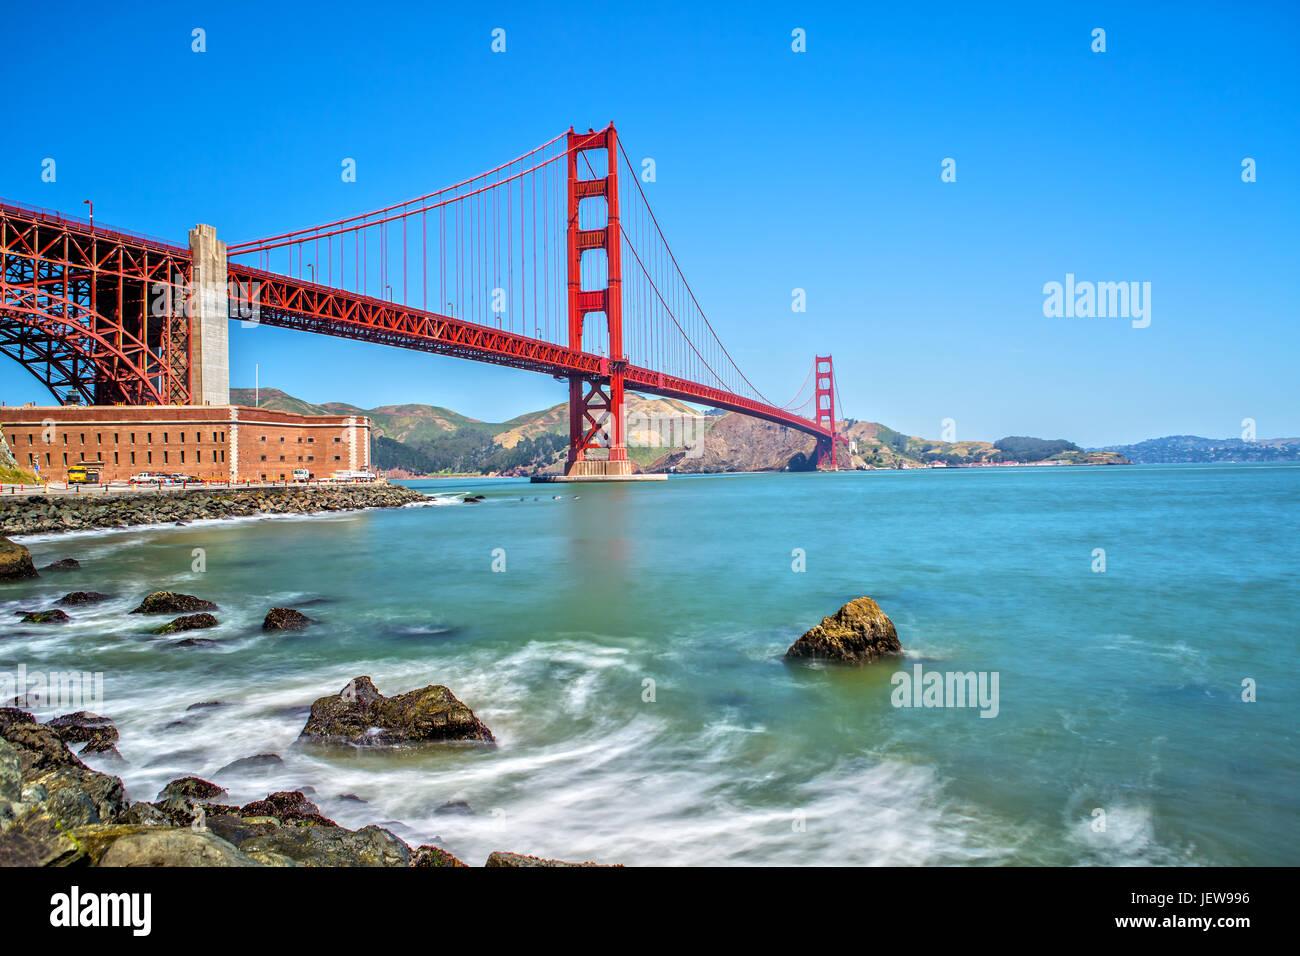 Long Exposure of Golden Gate Bridge in San Francisco - Stock Image